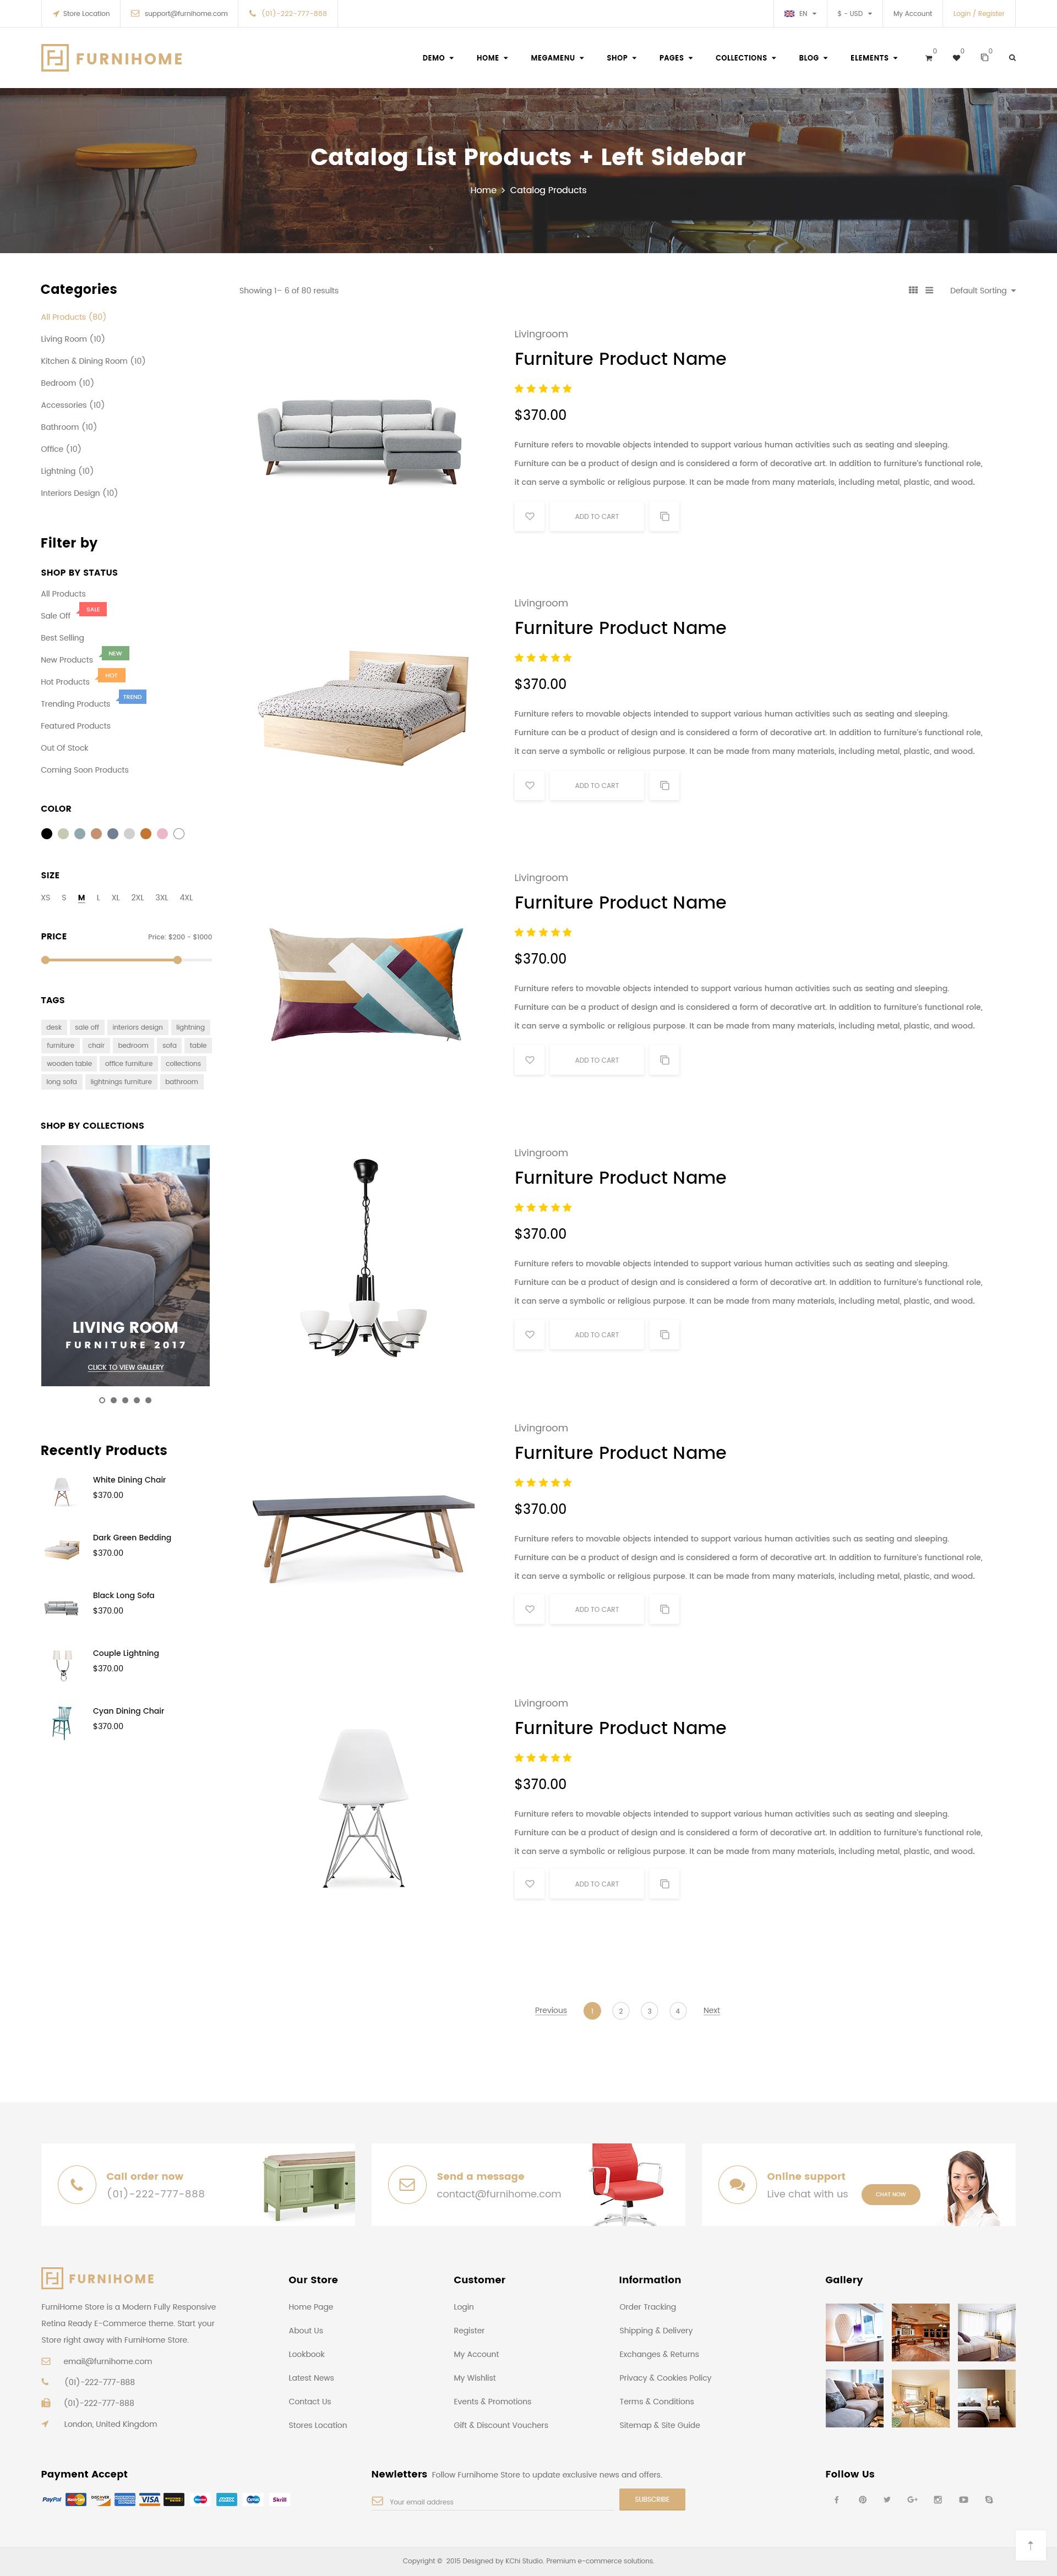 Furnihome E Commerce Psd Template For Furniture Store By Kchi